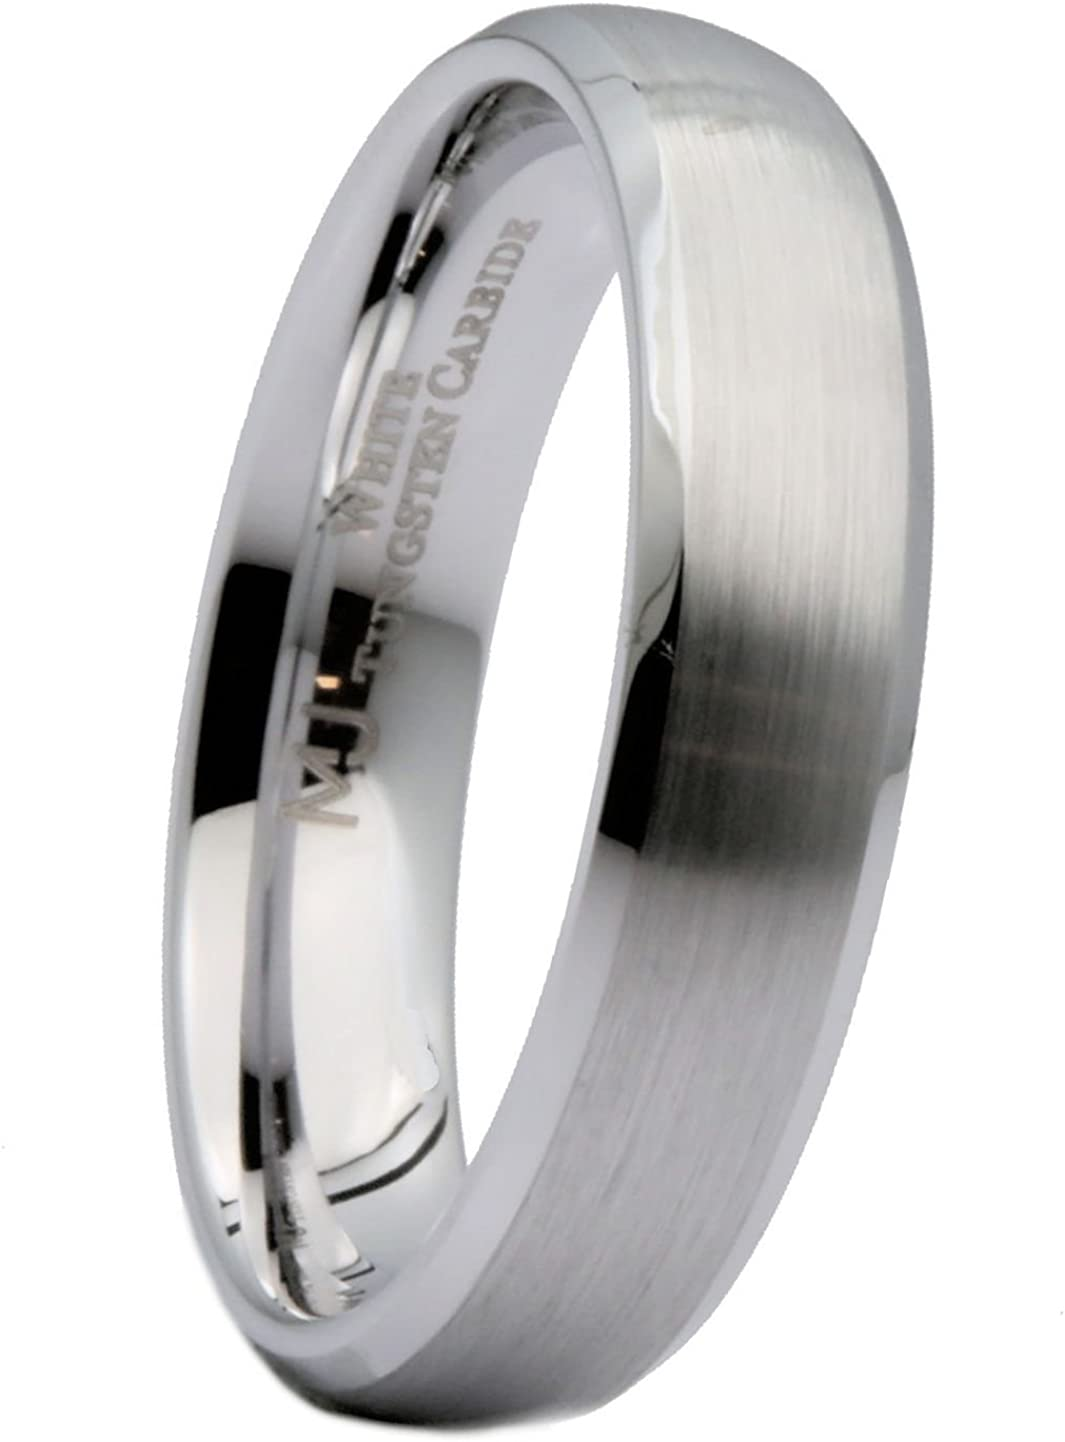 MJ Metals Jewelry Brushed Polished Edges Titanium 5mm-8mm Wedding Band Comfort Fit Band